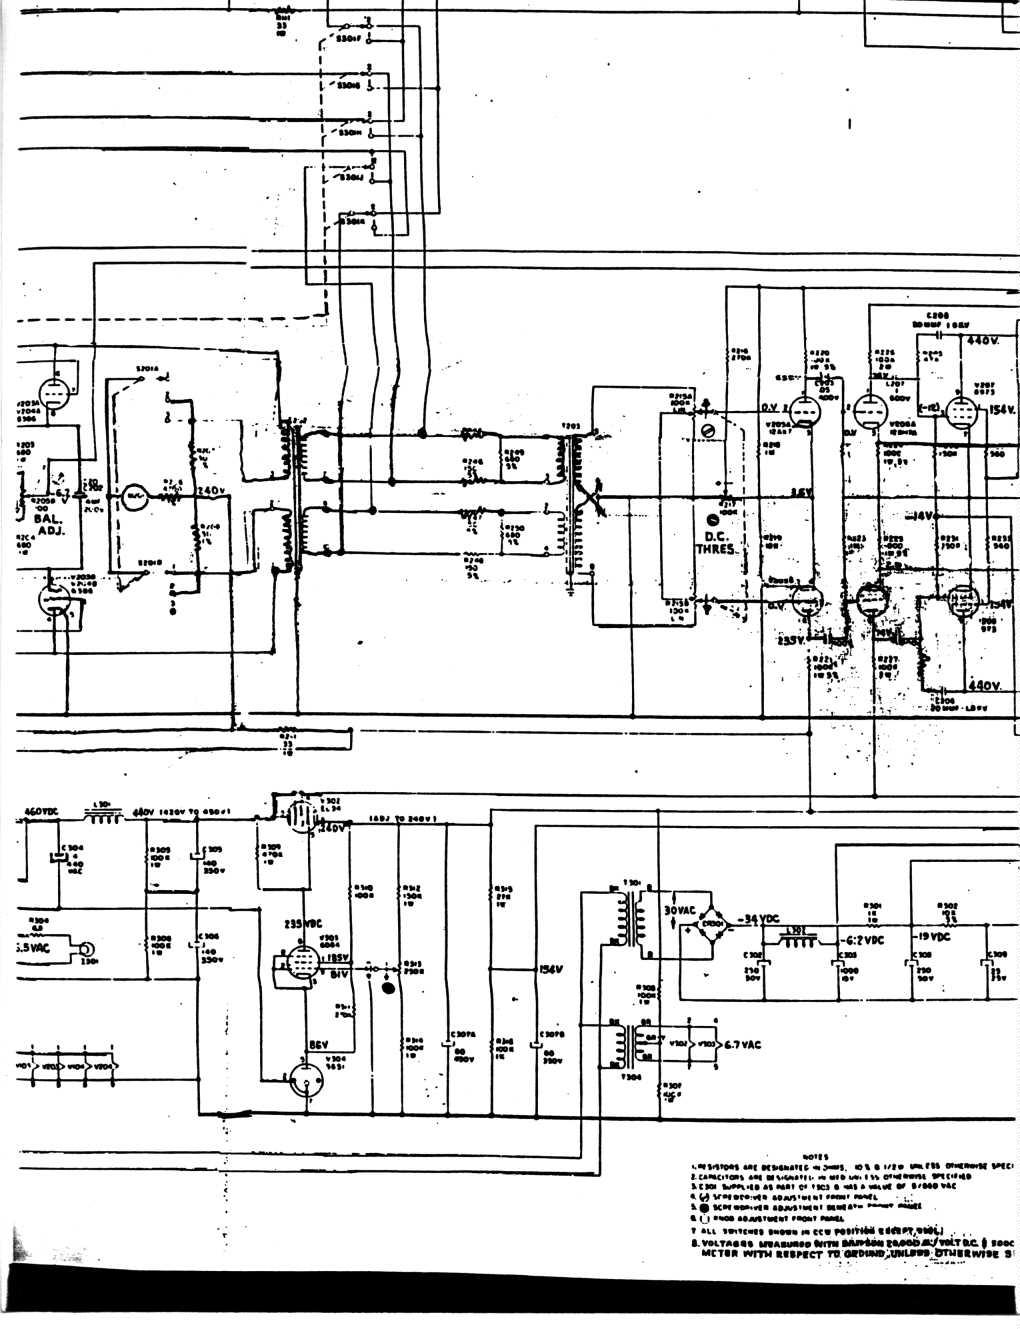 hight resolution of fisher k 10 spacexpander reverb fisher pr 6 preamplifier genelex basic preamps genelex basic tone controls phono eq genelex tape eq bass treble boost